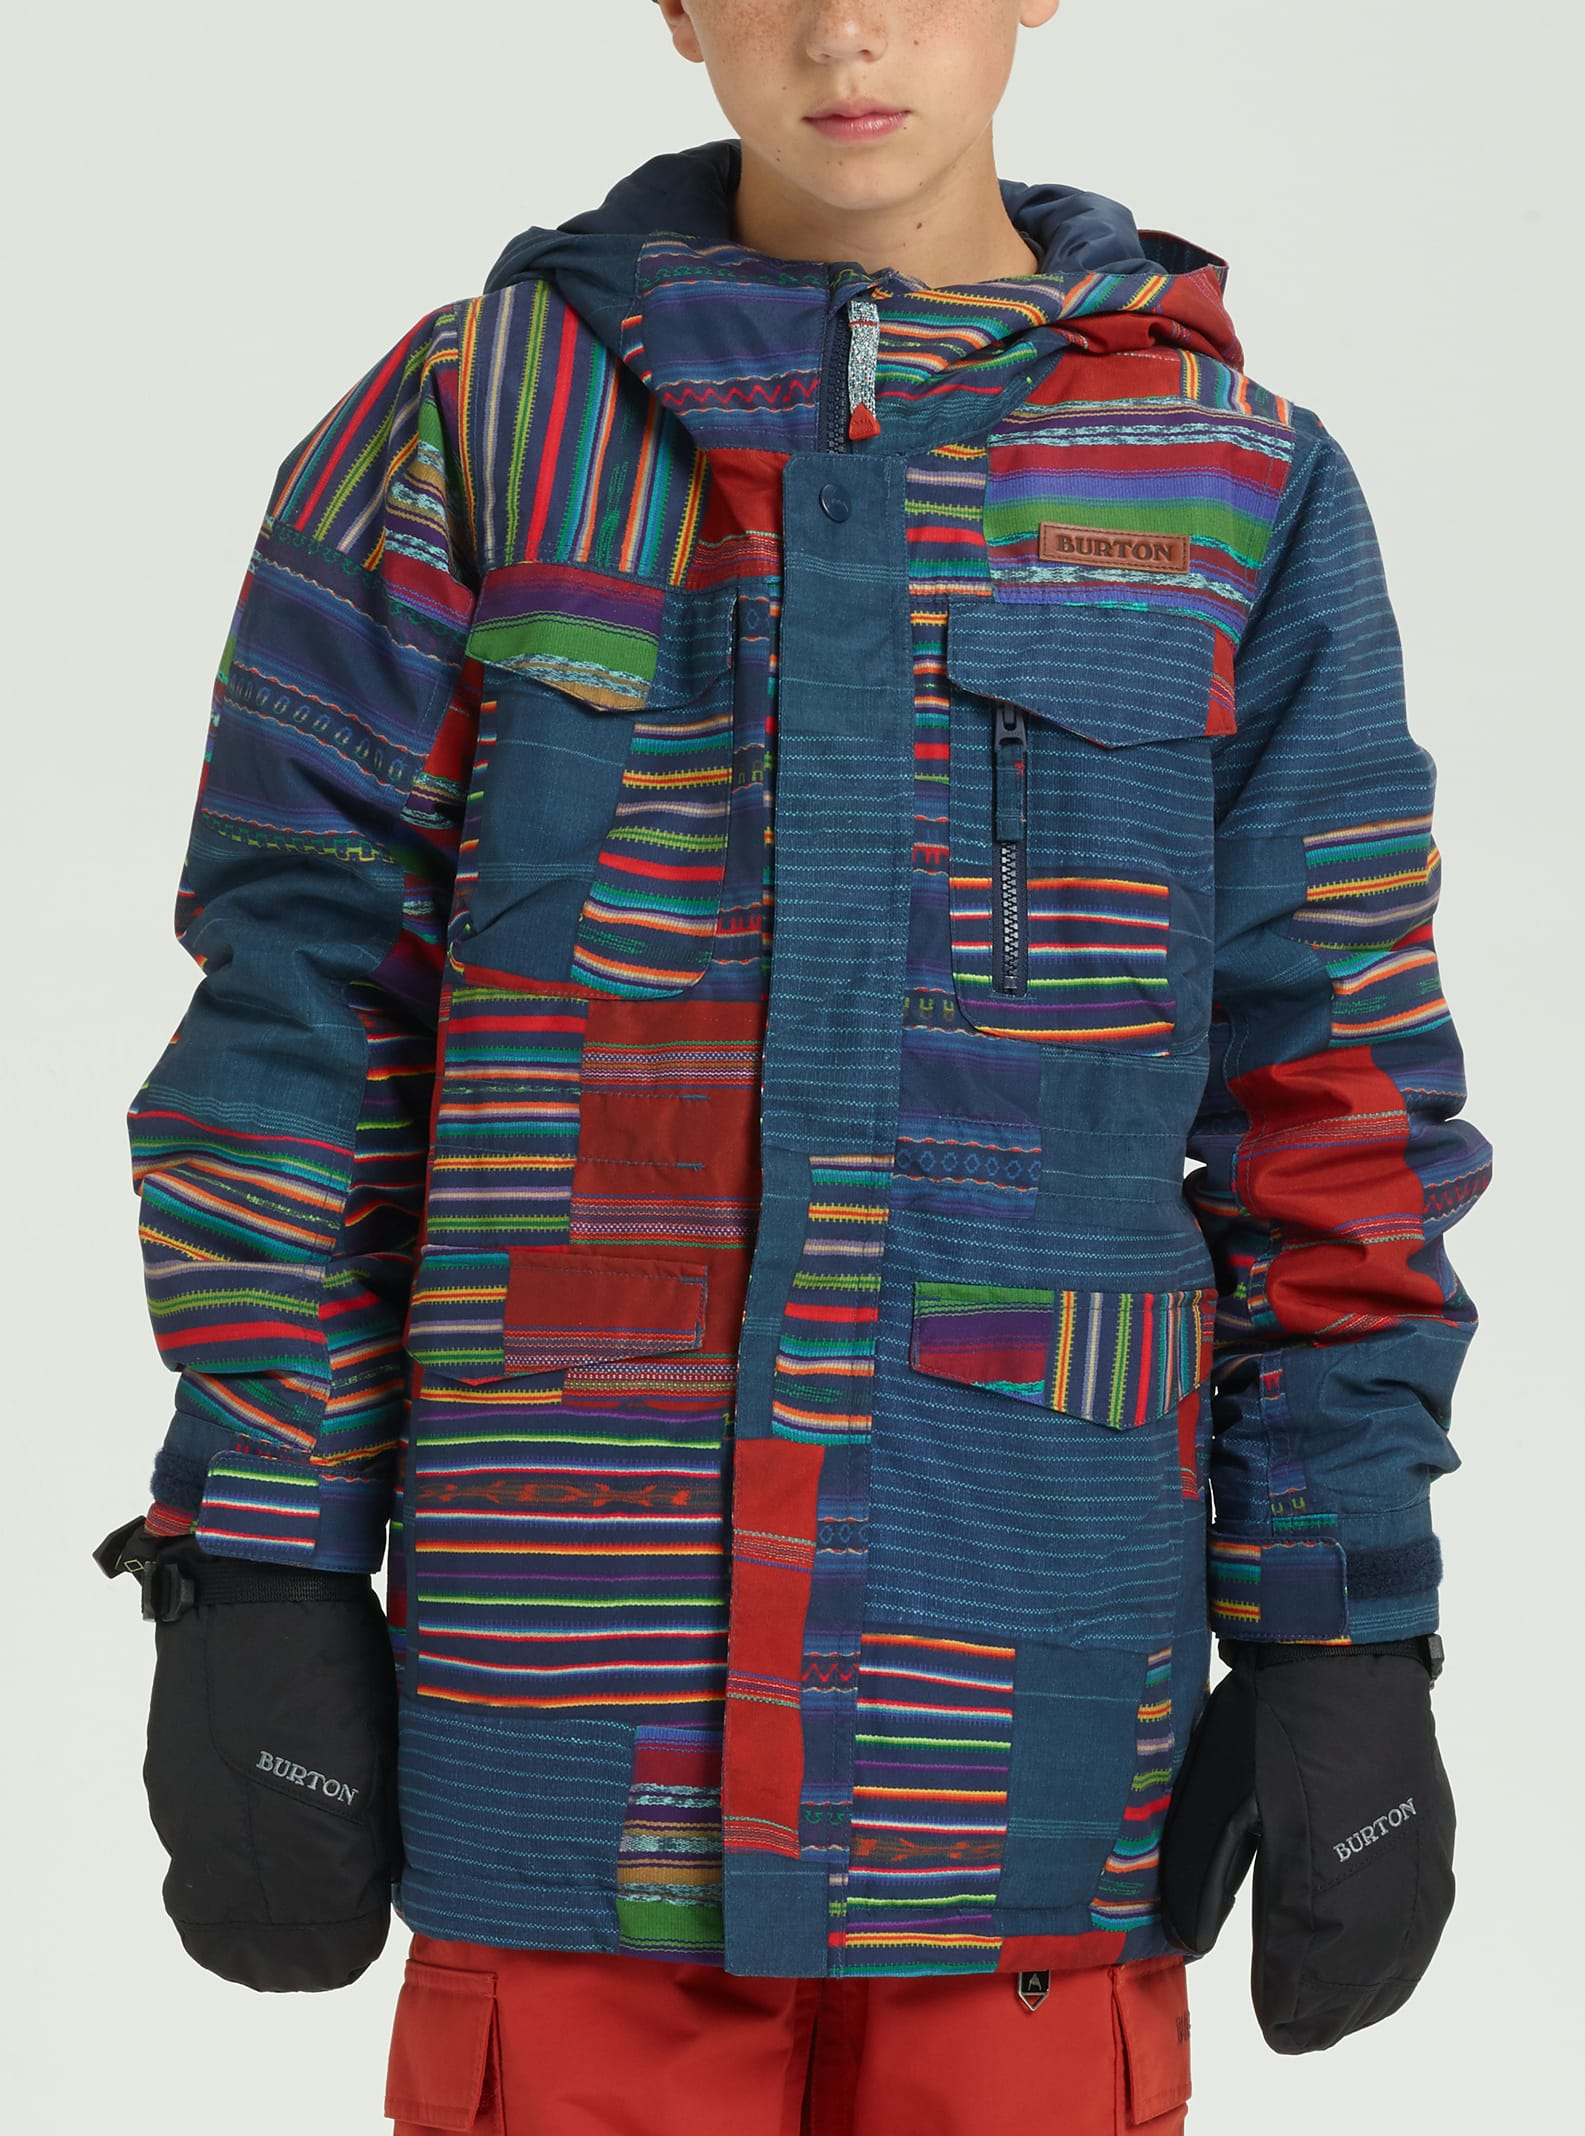 d3bac5009 Kids  Sale Jackets   Outerwear